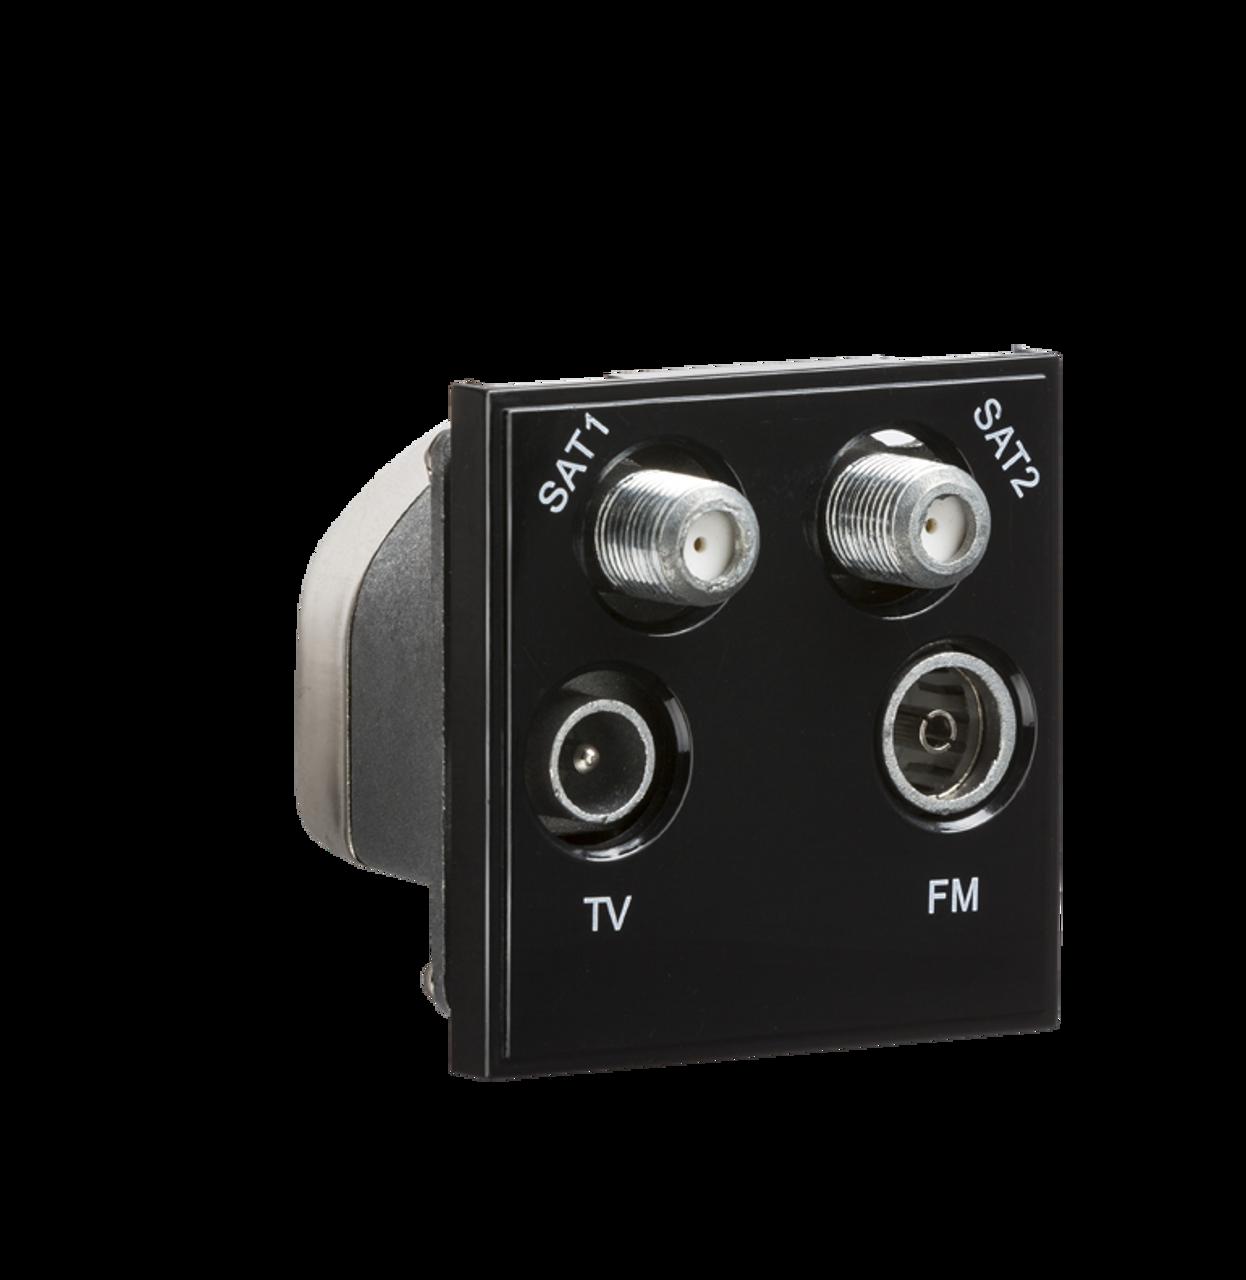 Pleasing Black Modular Quadplexed Sat1 Sat2 Tv Fm Dab Outlet Dfl1Netqdbk Wiring Digital Resources Jebrpkbiperorg